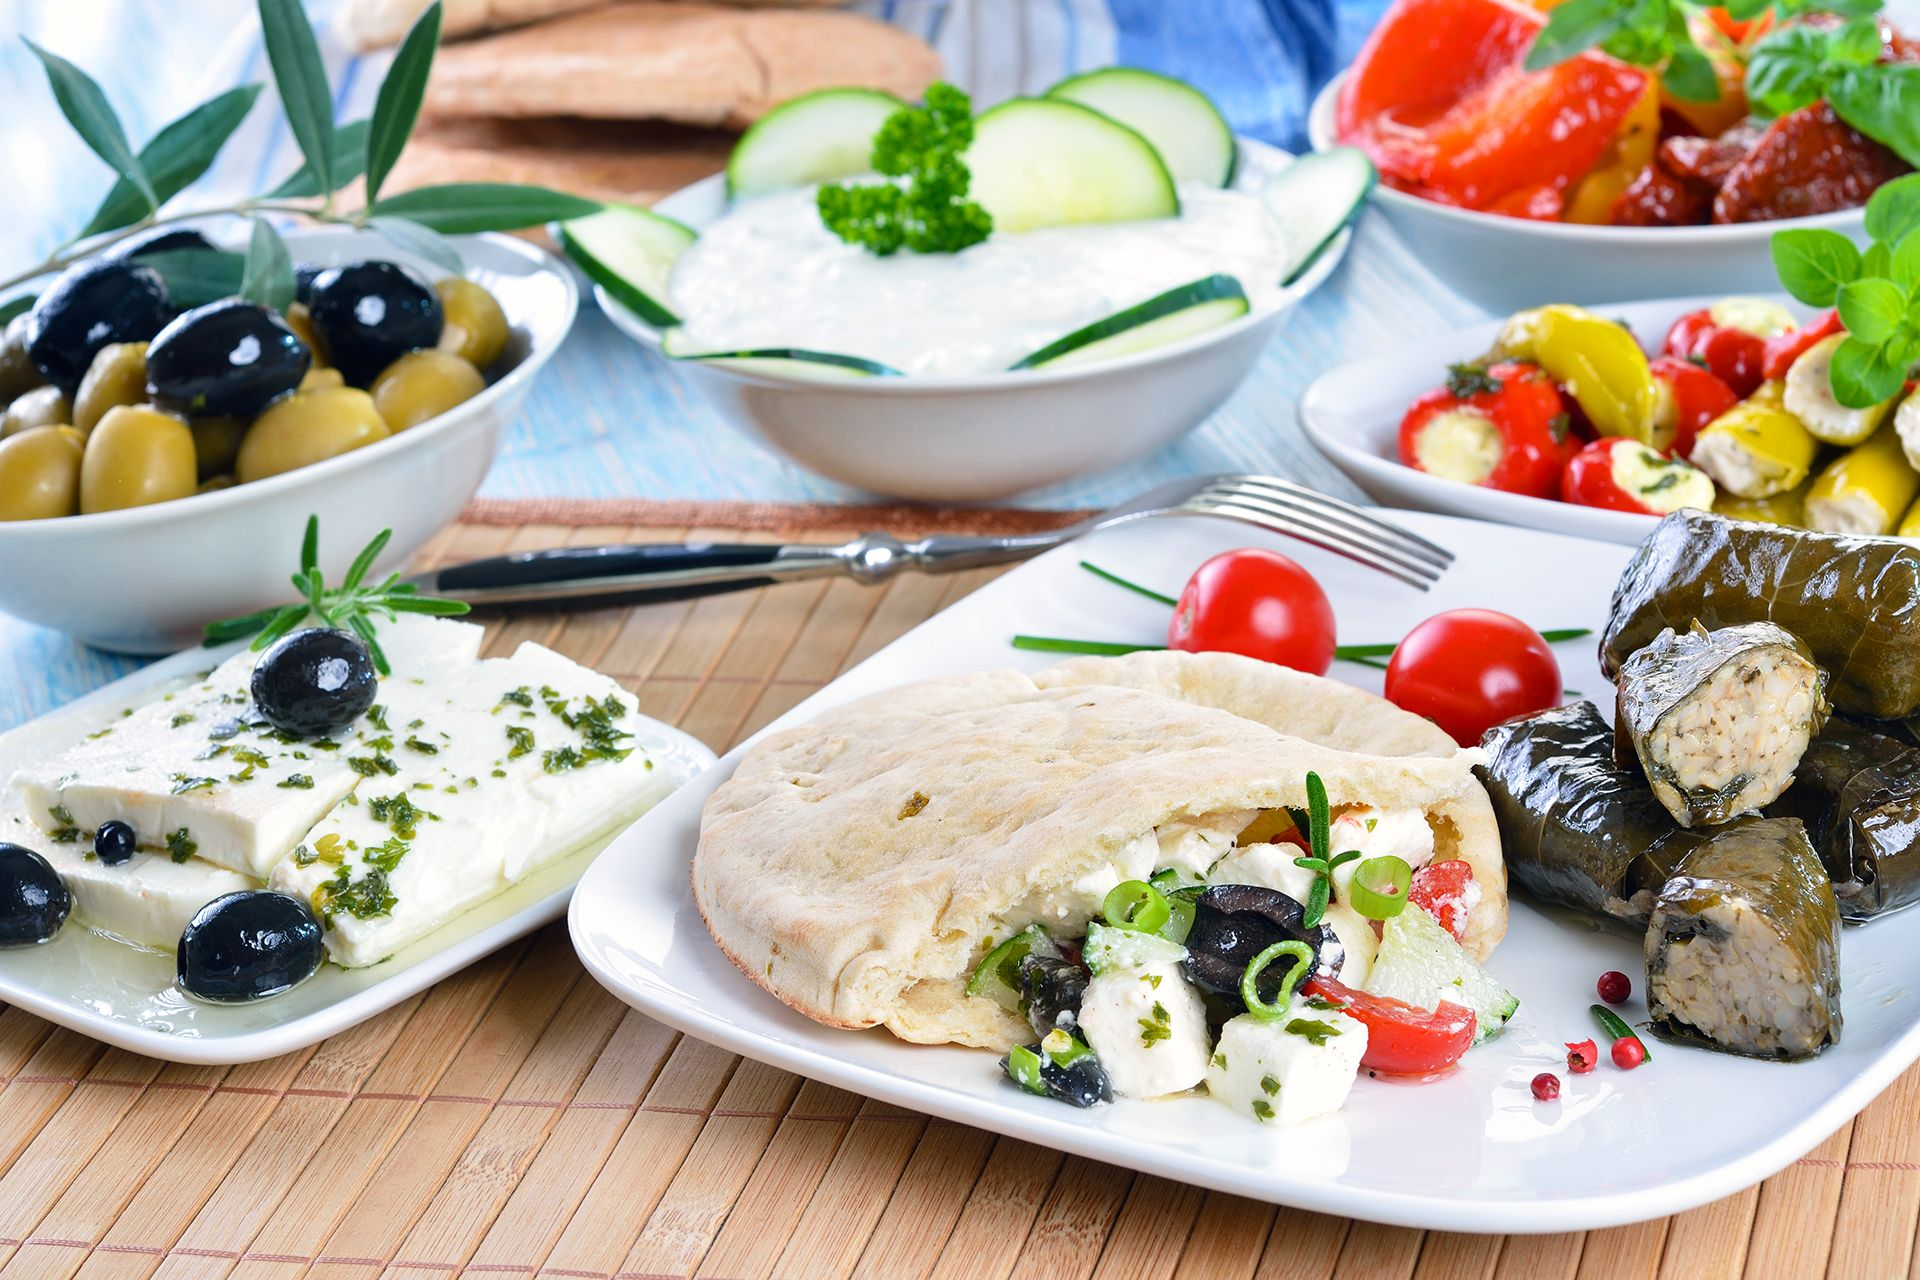 Mediterrane kuche dortmund